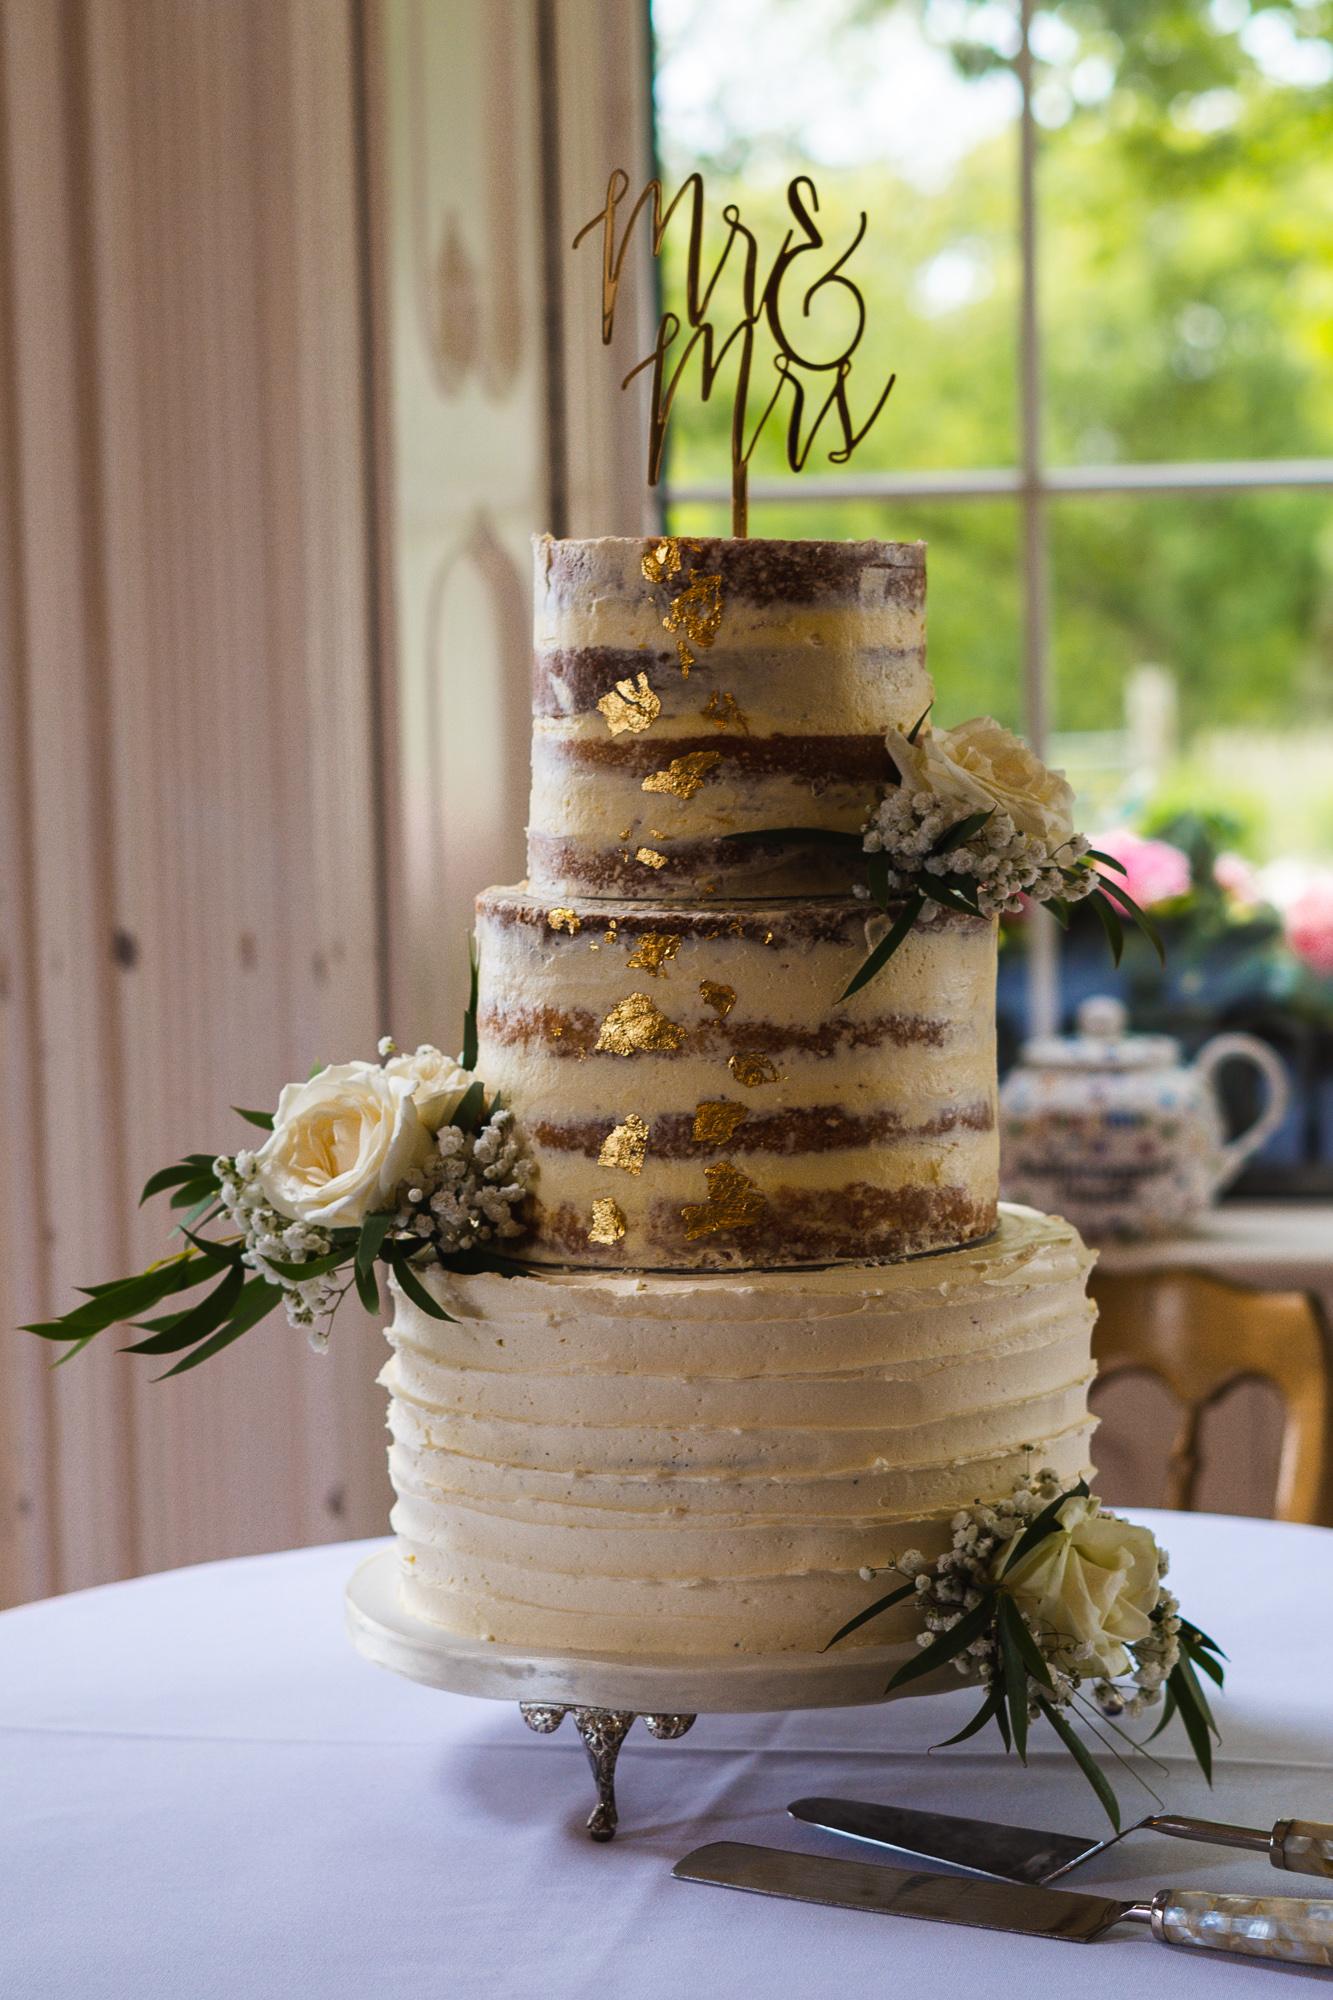 Semin naked and gold leaf wedding cake